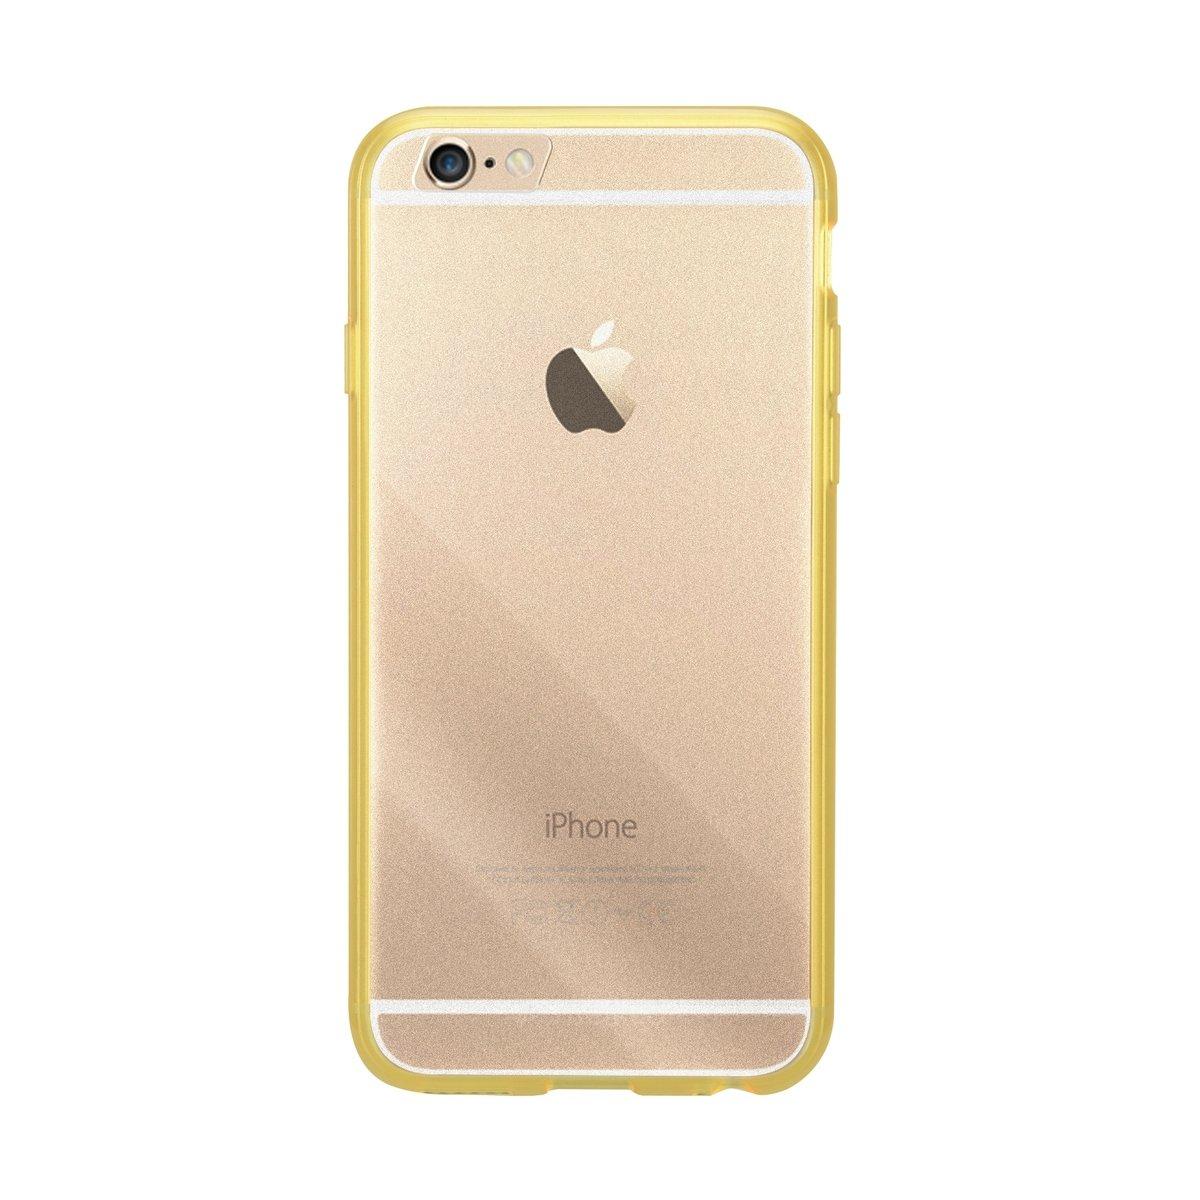 "iPhone 6 Plus/6S Plus (5.5"") PolyUltima 手機保護殼 - 透明黄色(附送屏幕保護貼)"